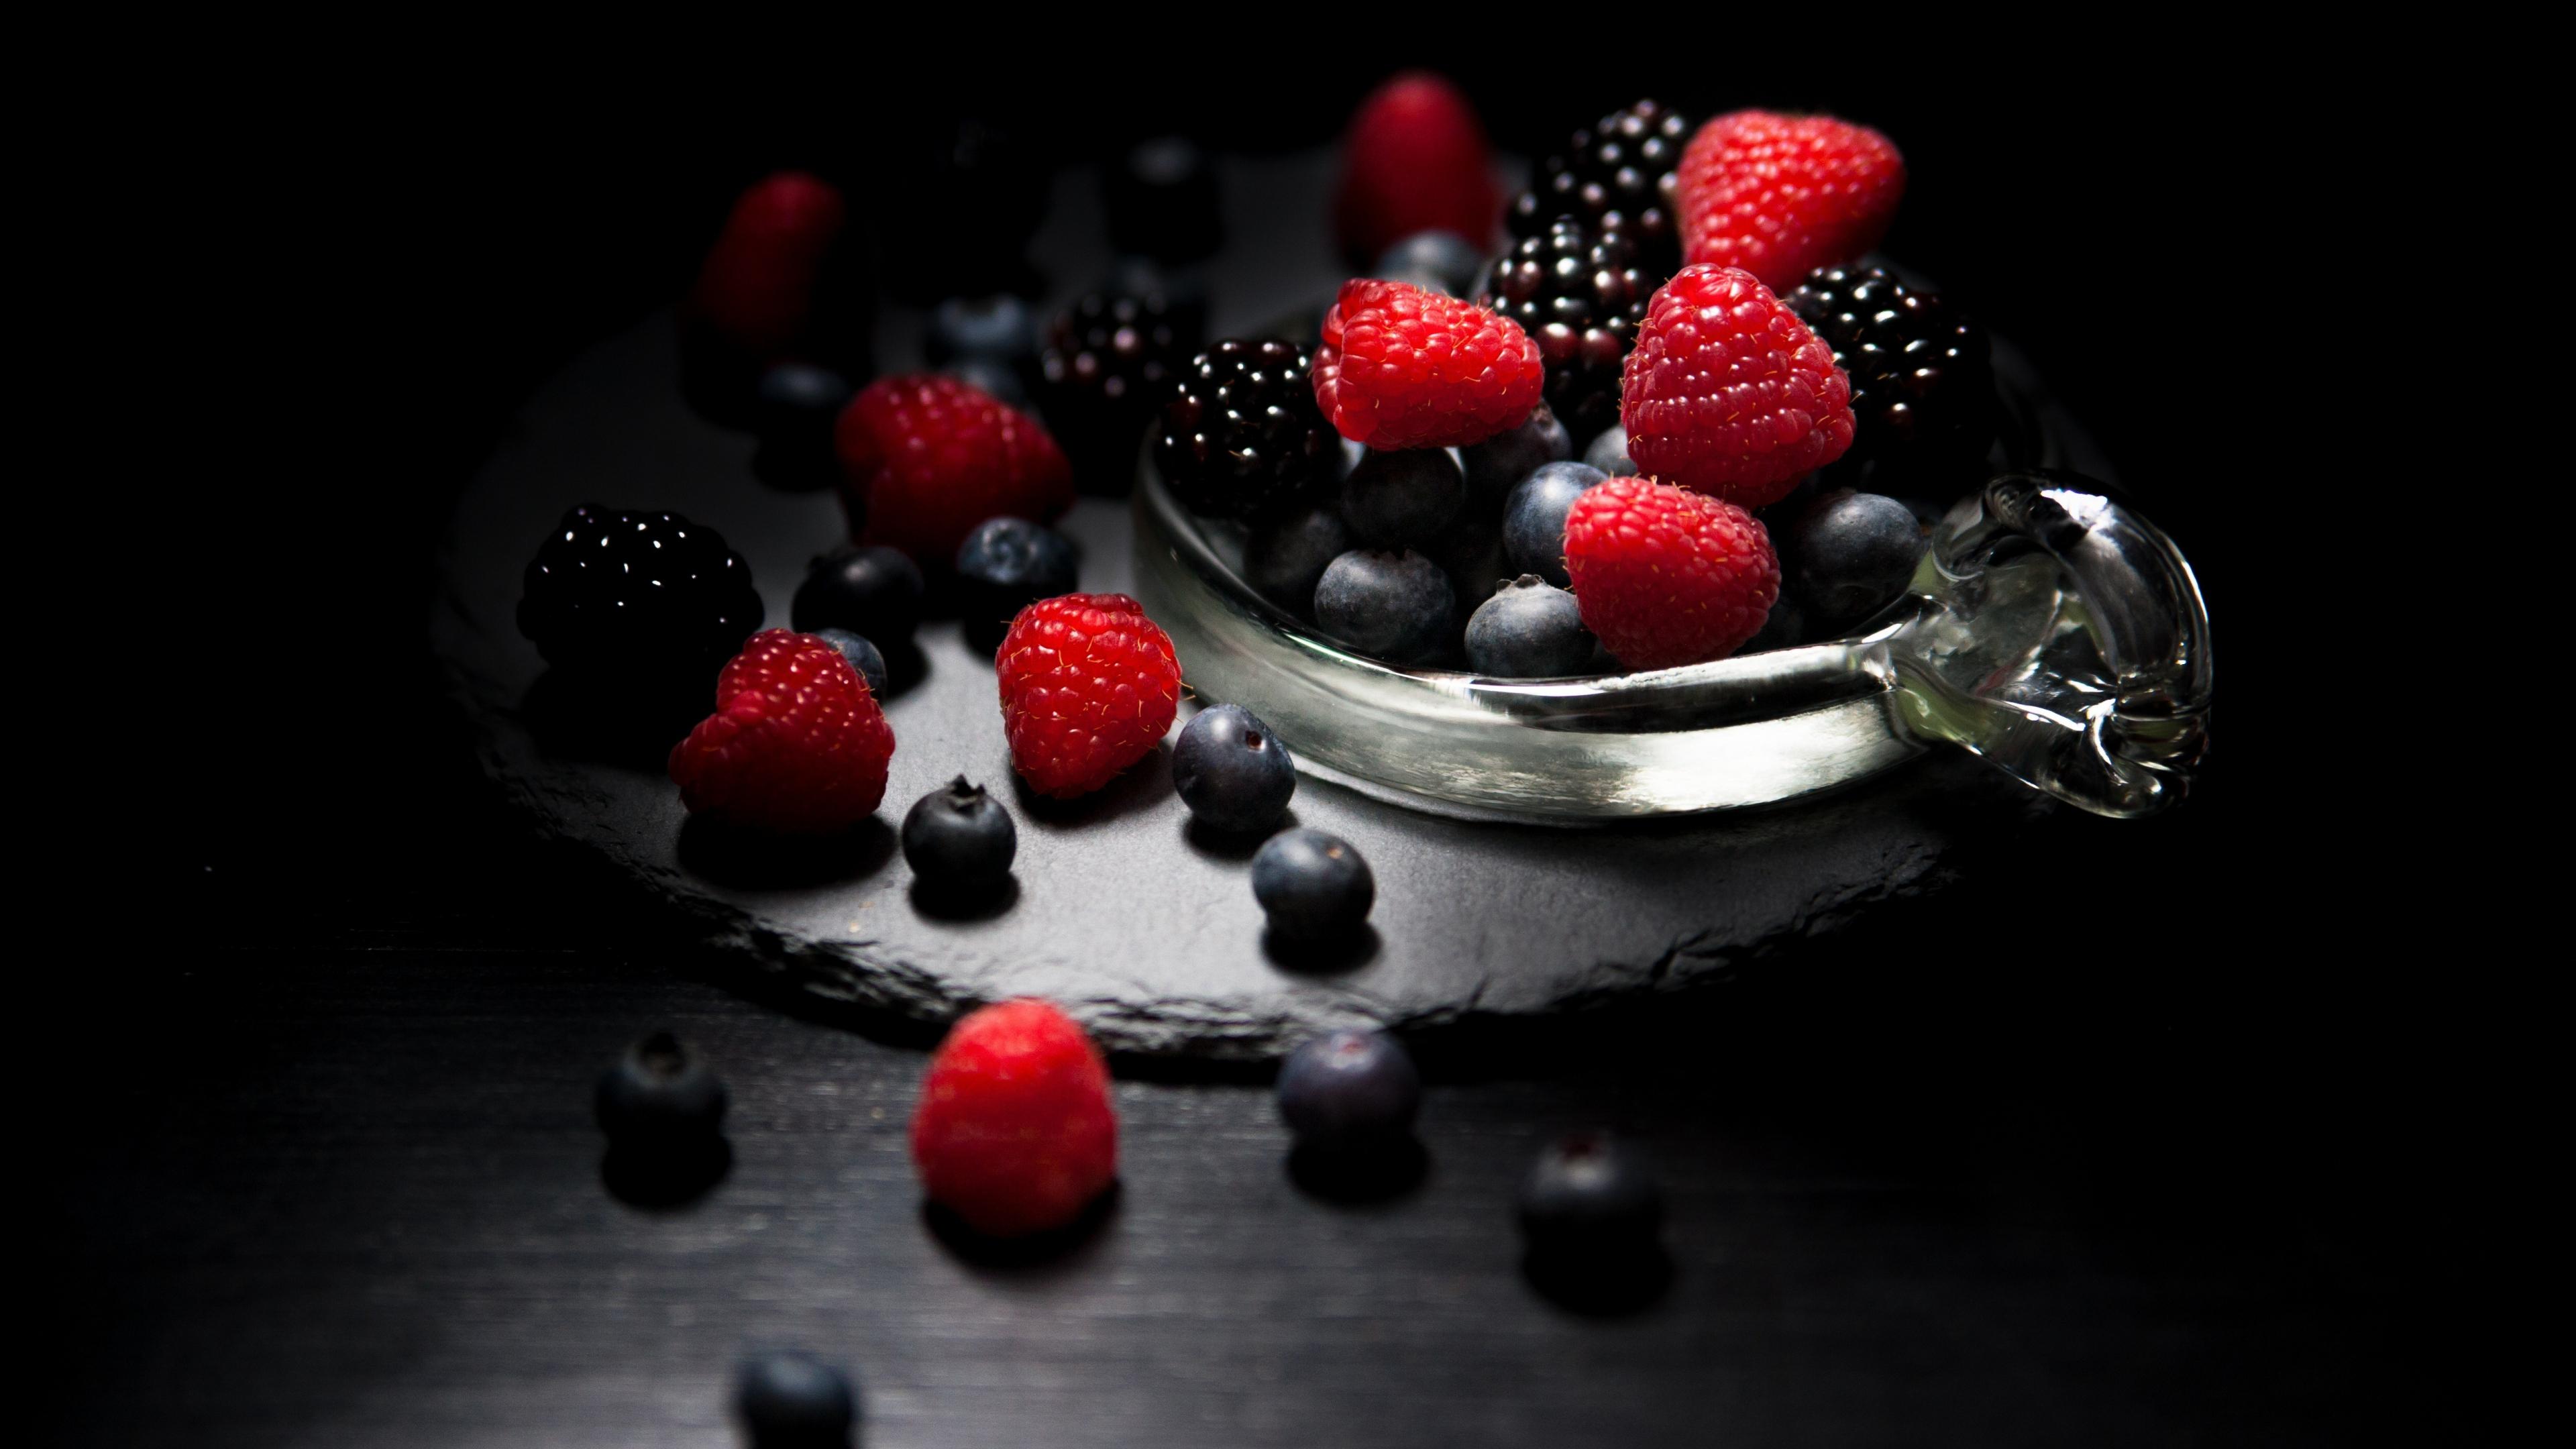 Dark mood, food, fruits, Raspberry, blueberry, Blackberry, 3840x2160 wallpaper